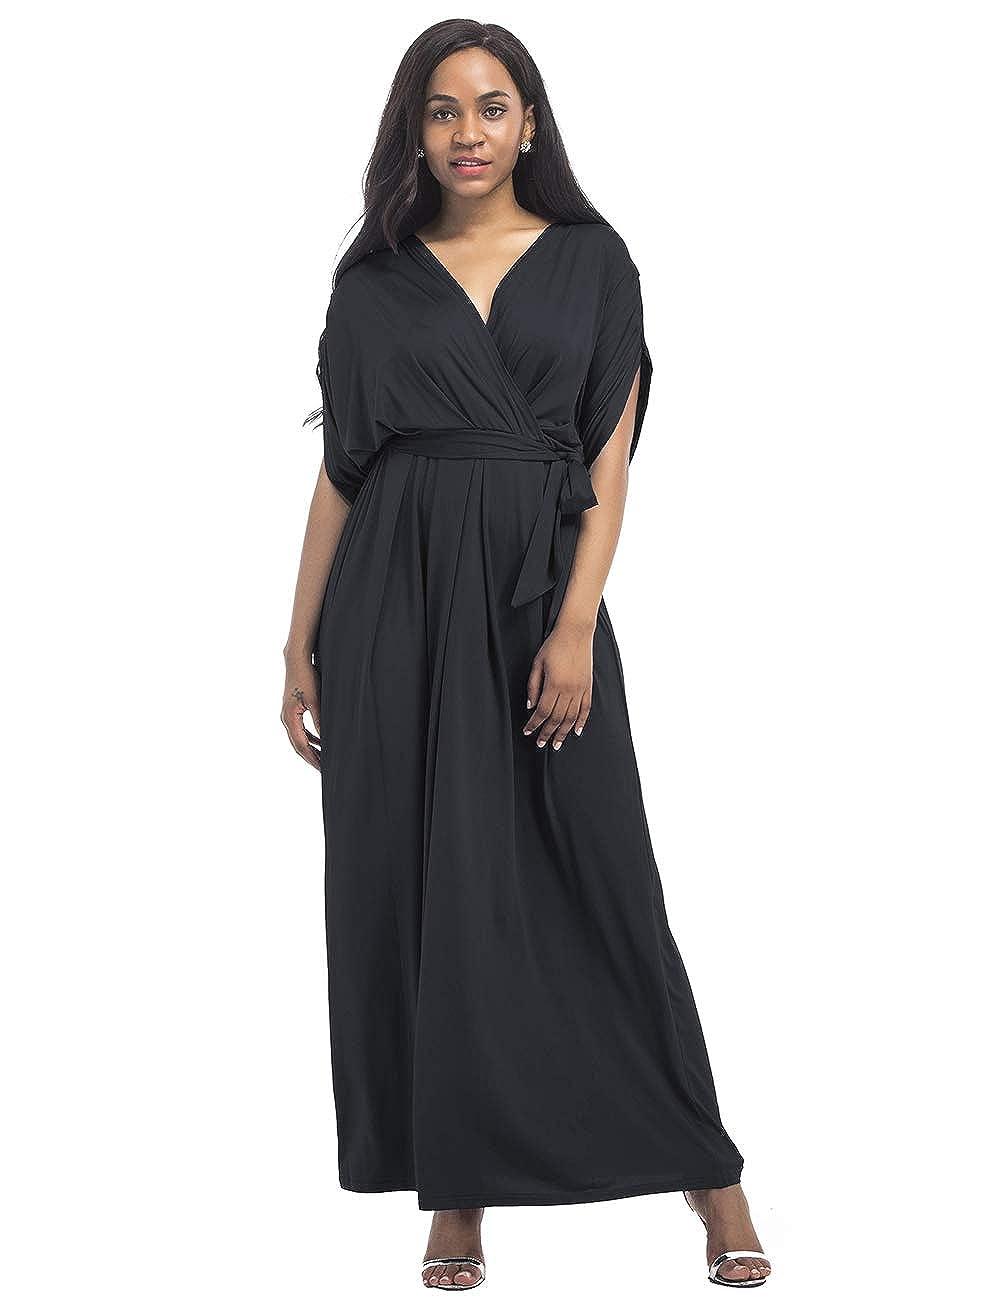 Rela Bota Women Plus Size V Neck Batwing Sleeve Casual Maxi Dress with Belt